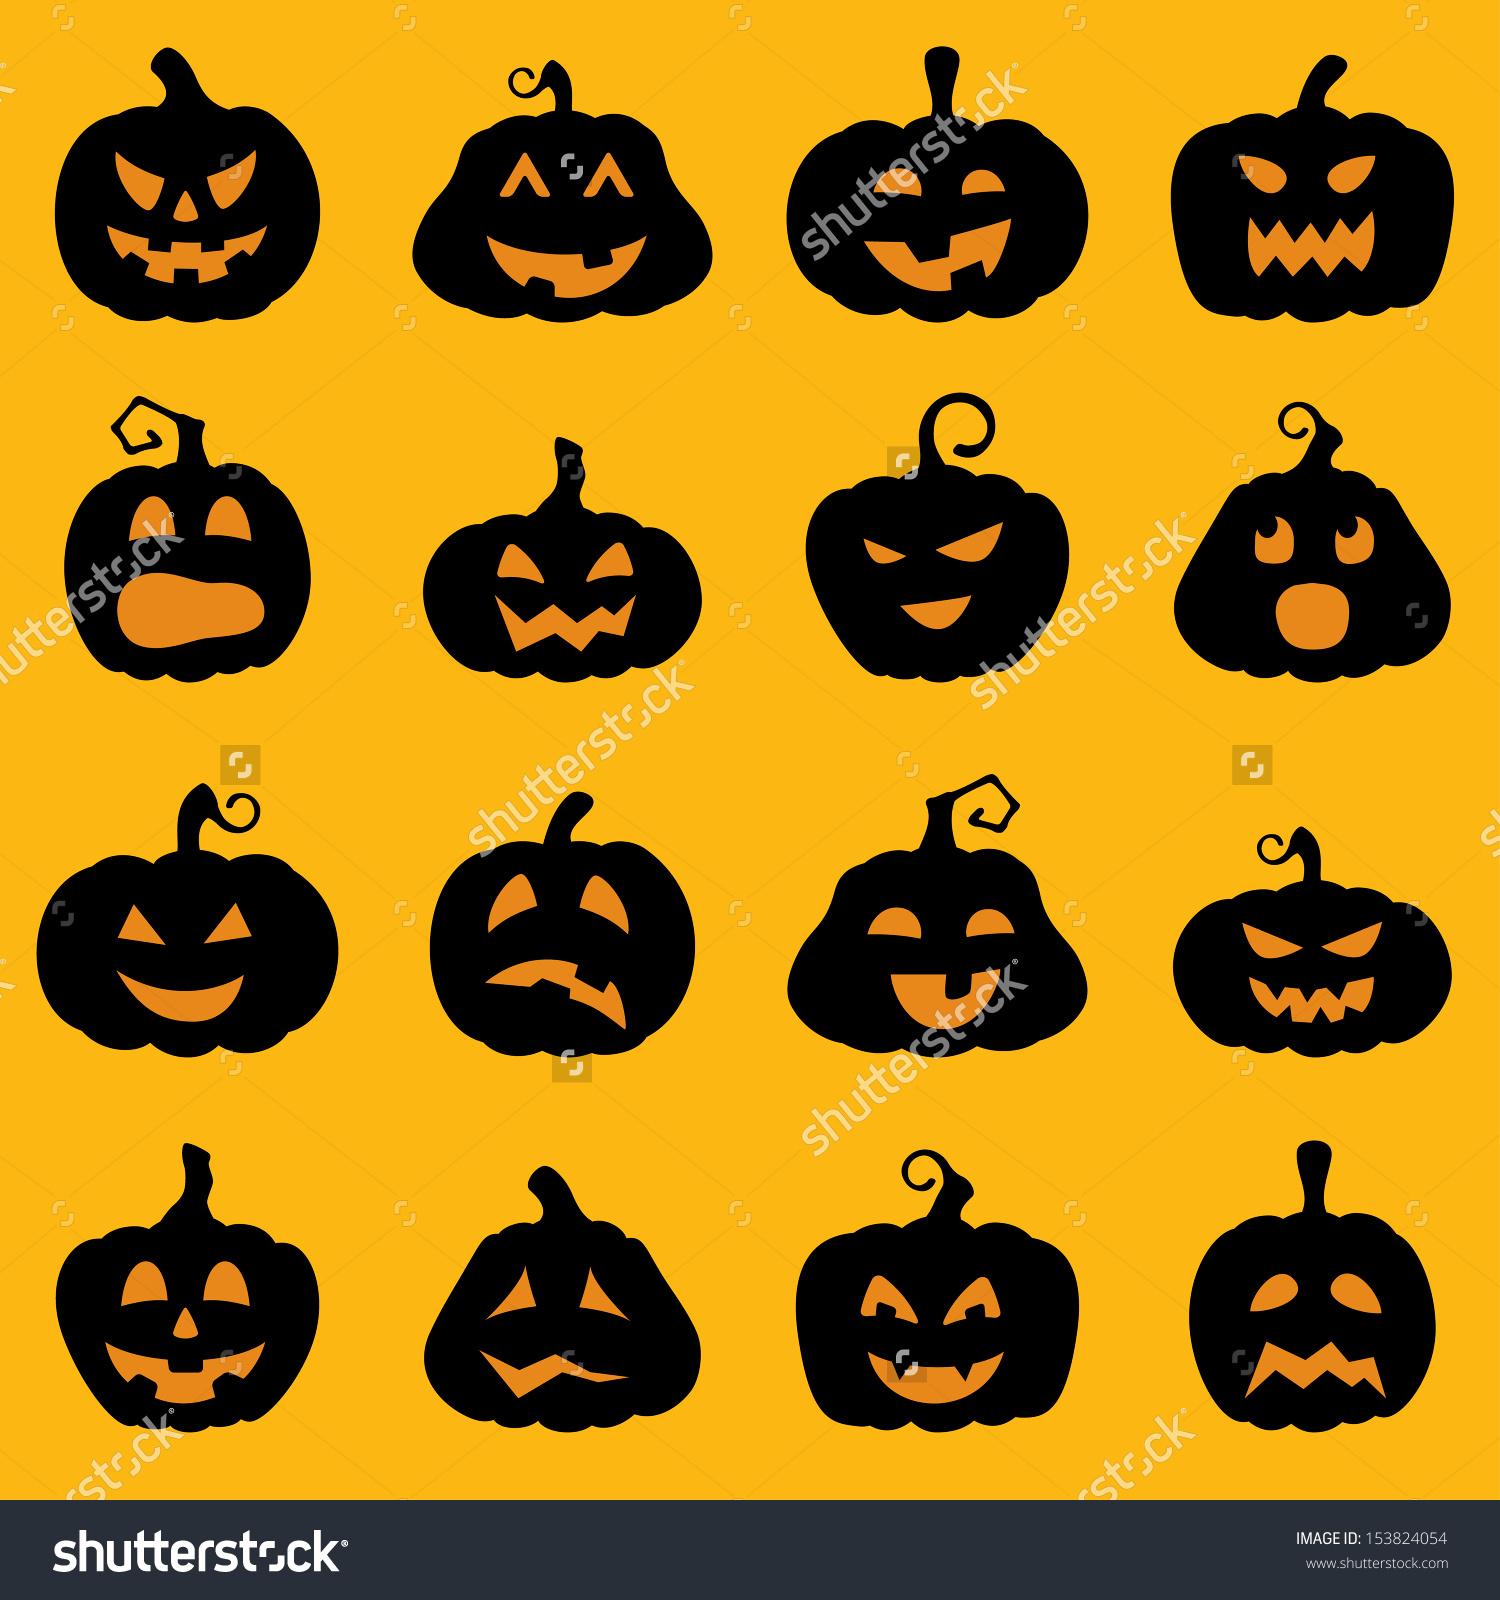 Halloween Decoration Jackolantern Silhouette Set Pumpkins Stock.